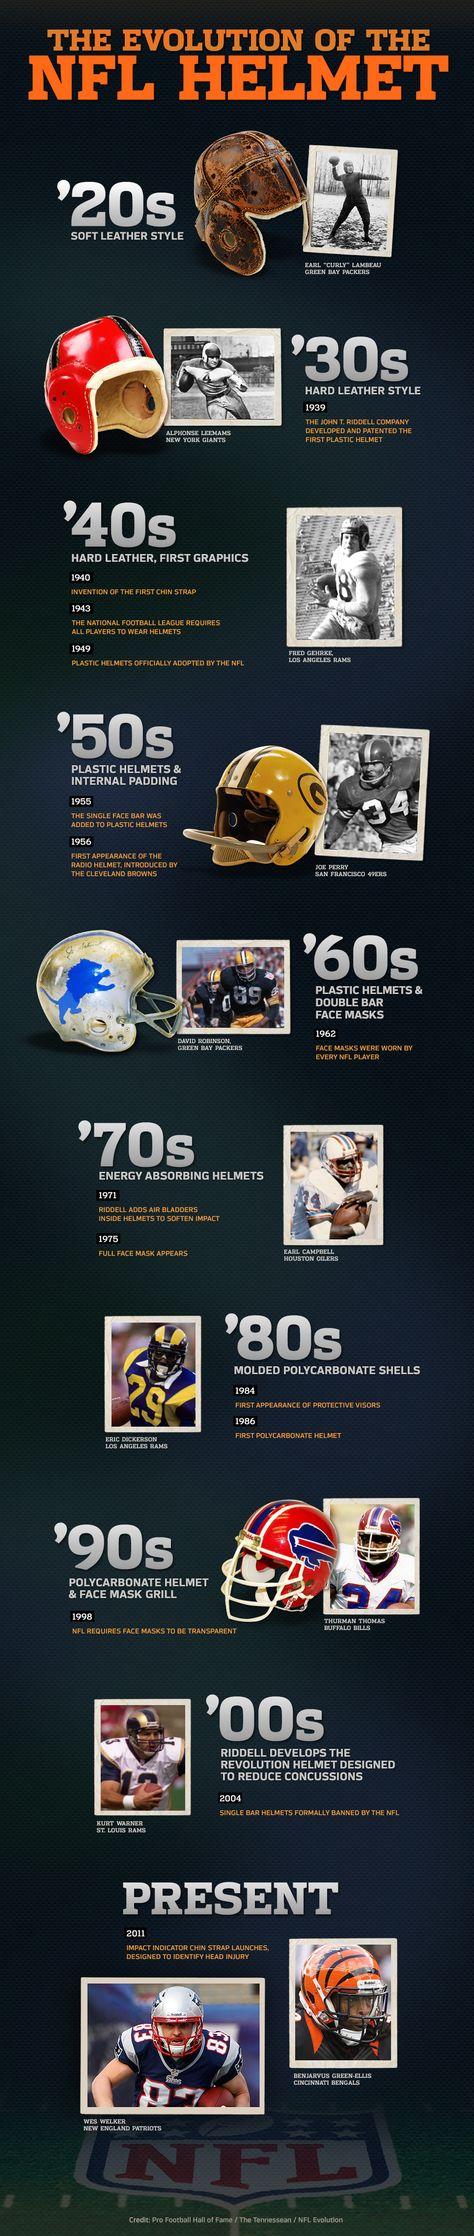 NFL Helmet History